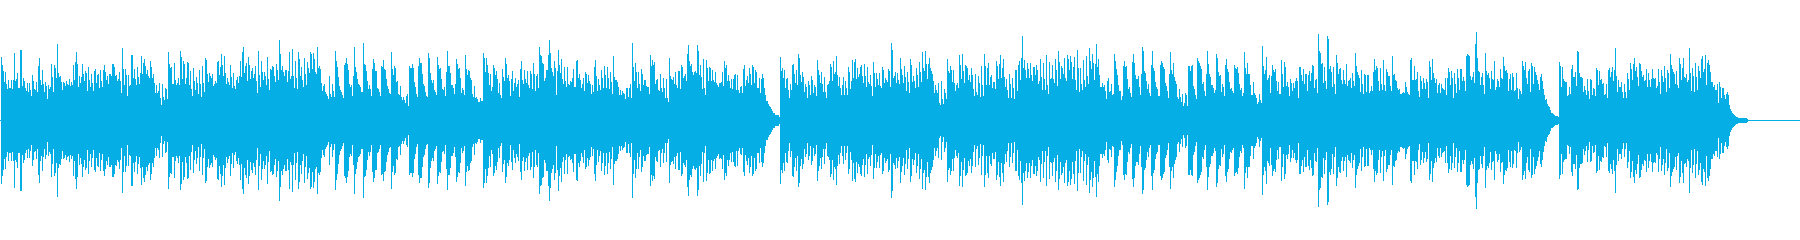 RPGゲームで不思議な森に迷い込んだ様なの再生済みの波形